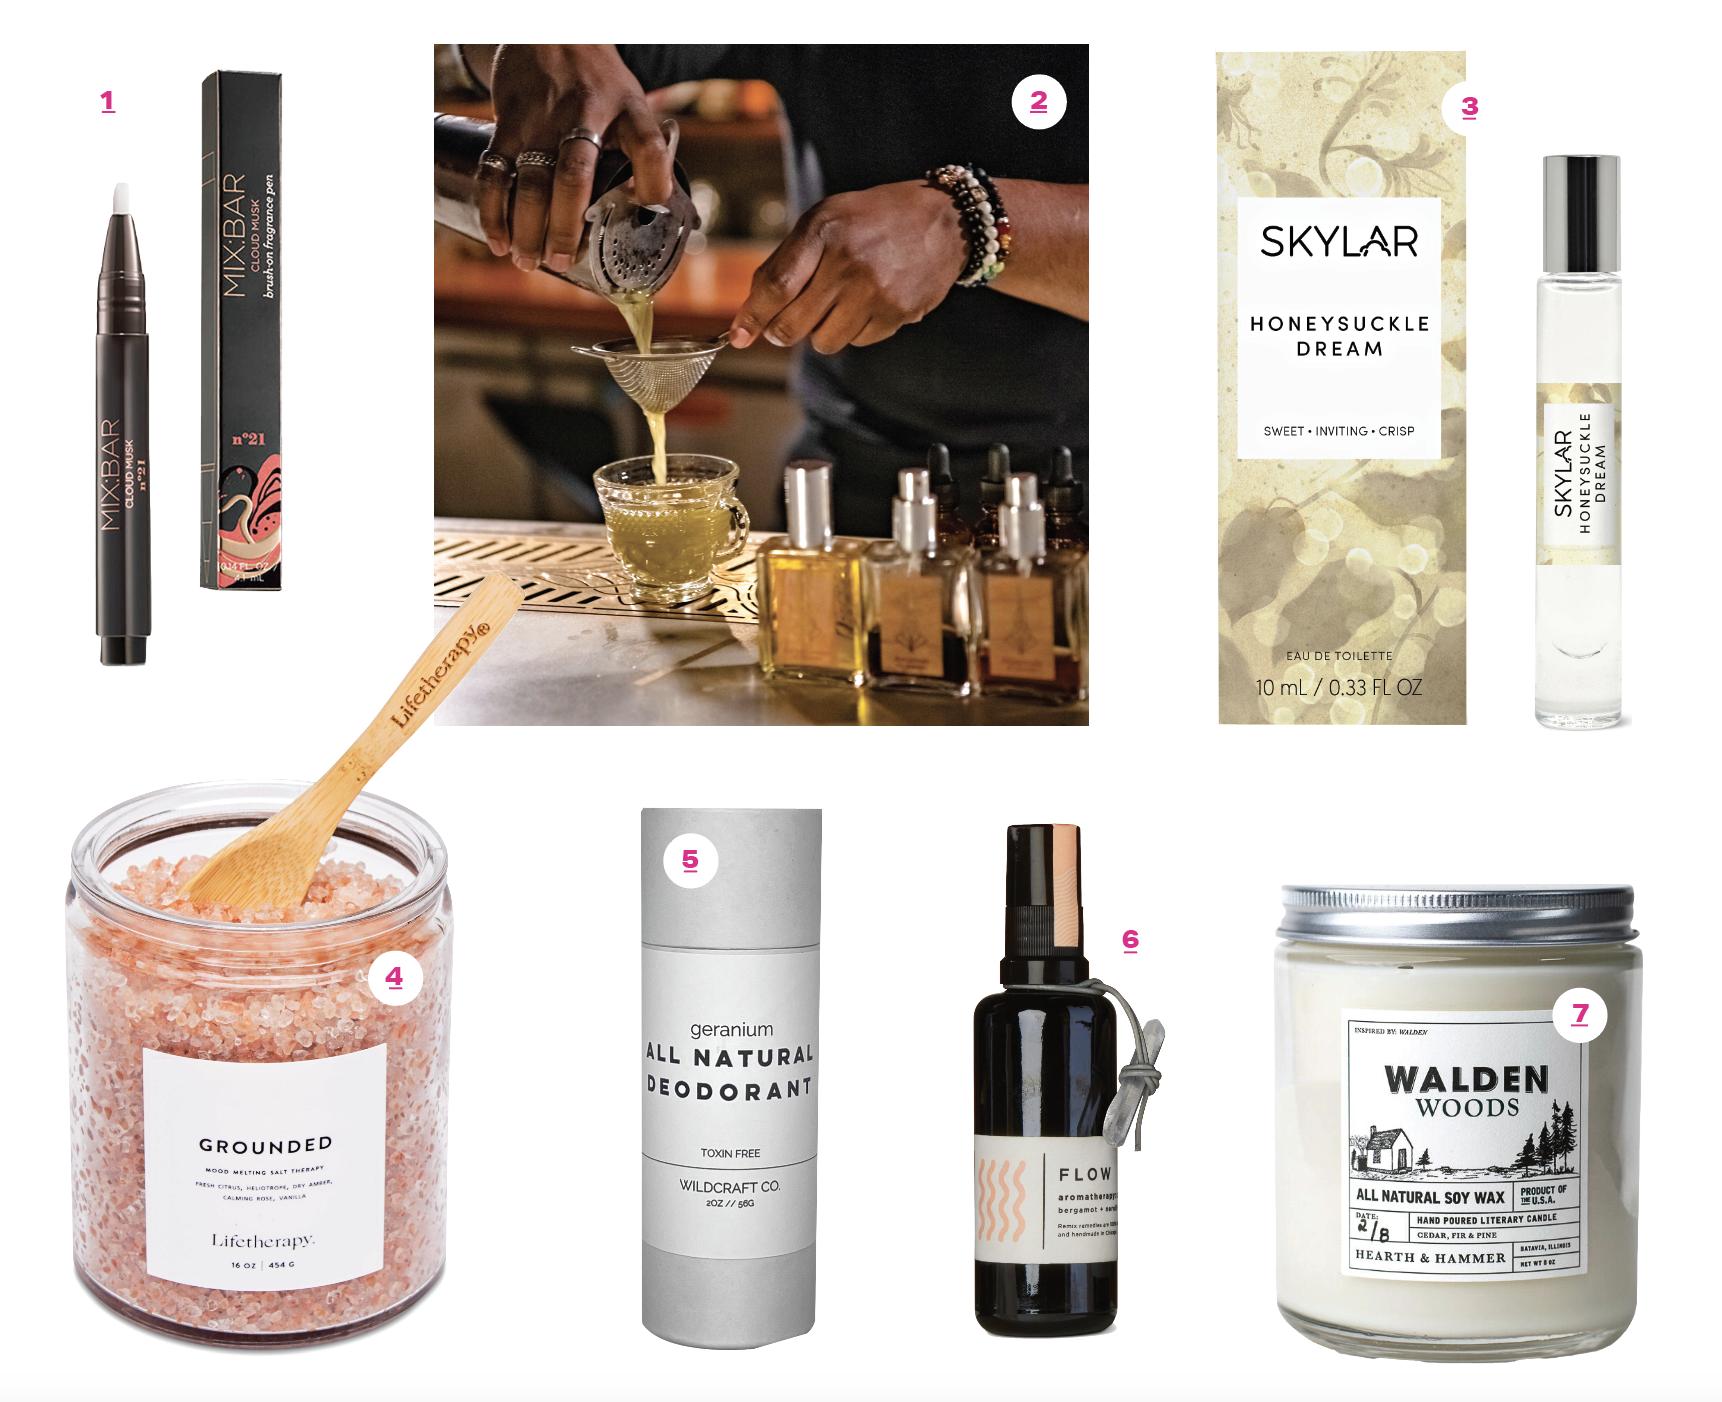 Perfume and Home Fragrances